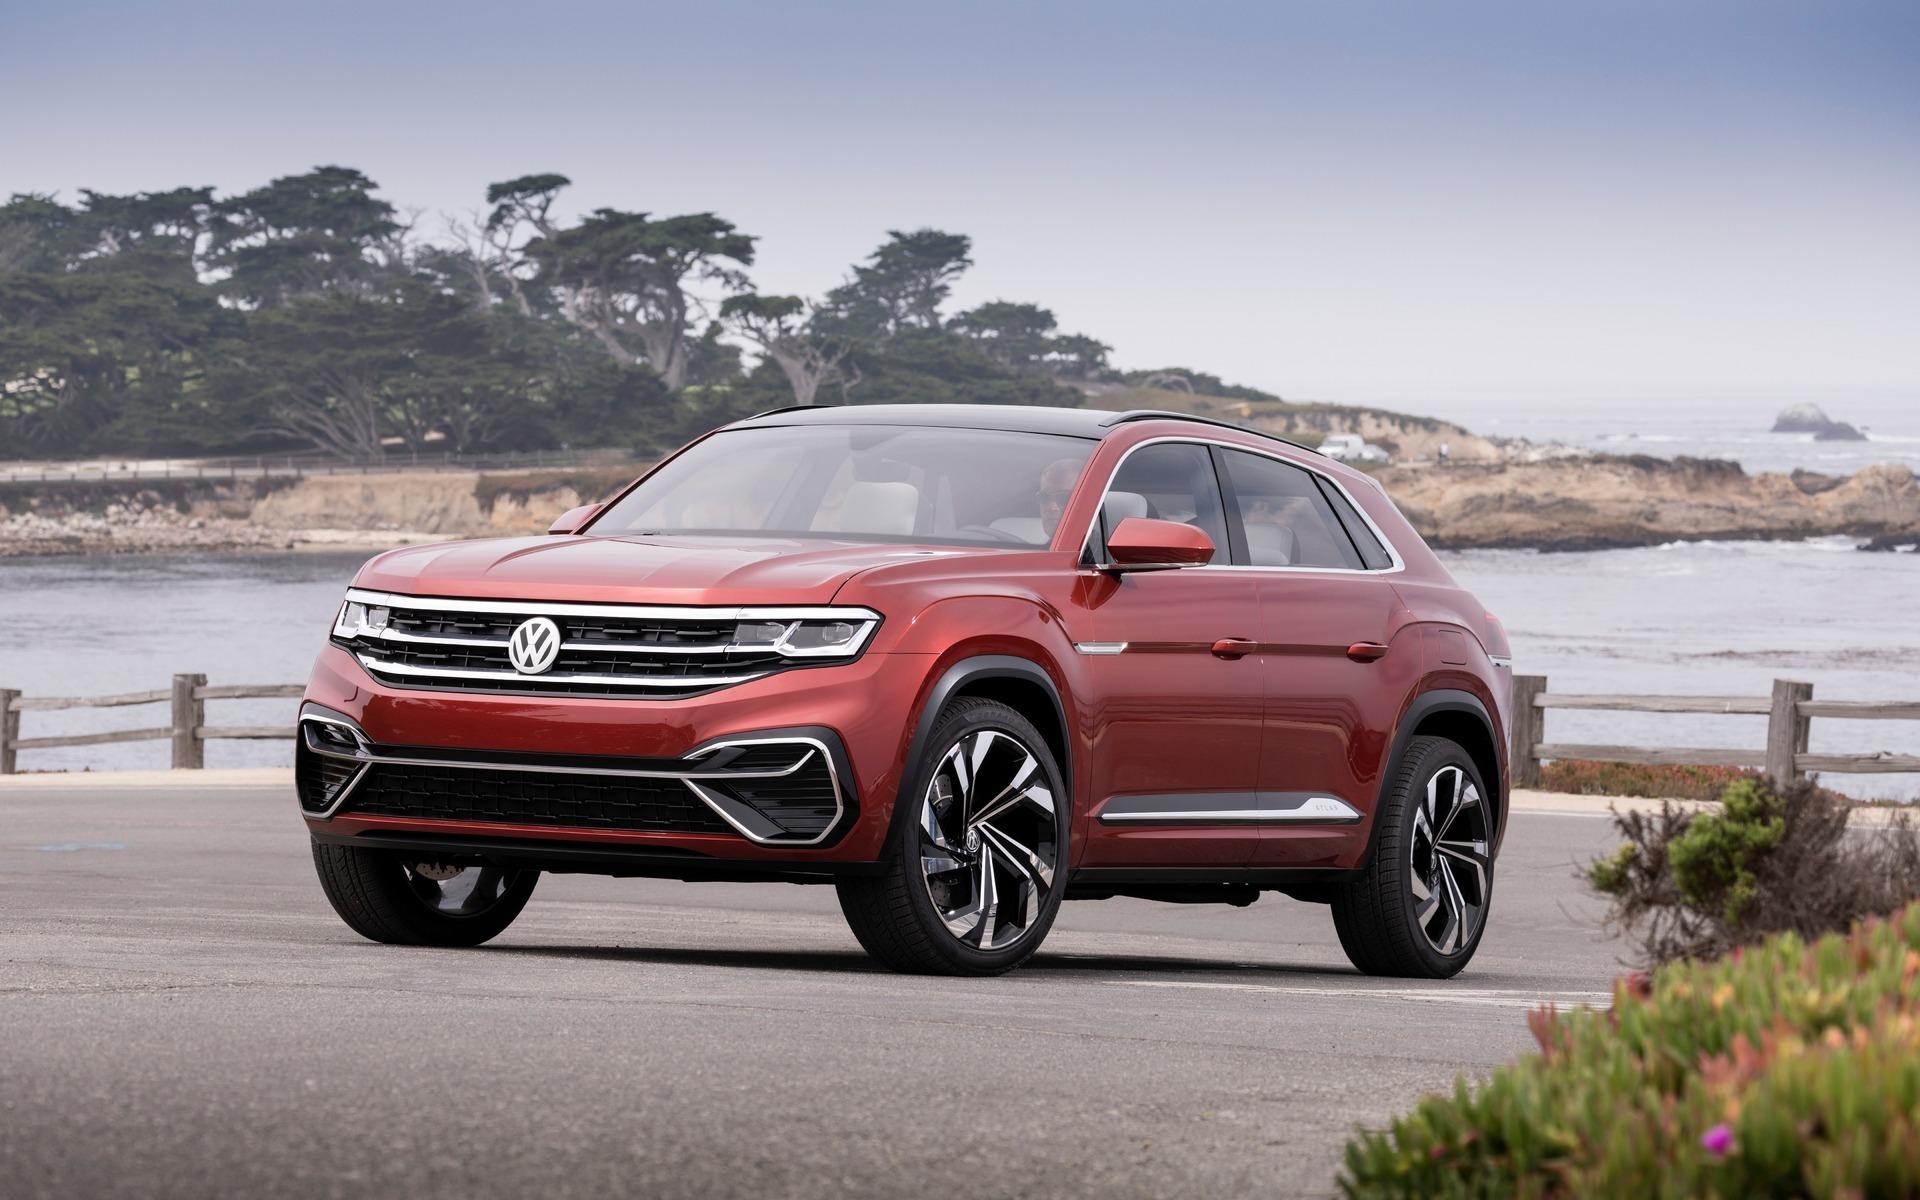 Volkswagen confirme le nom de son prochain VUS : Atlas Cross Sport 358510_Volkswagen_confirme_le_nom_de_son_prochain_VUS